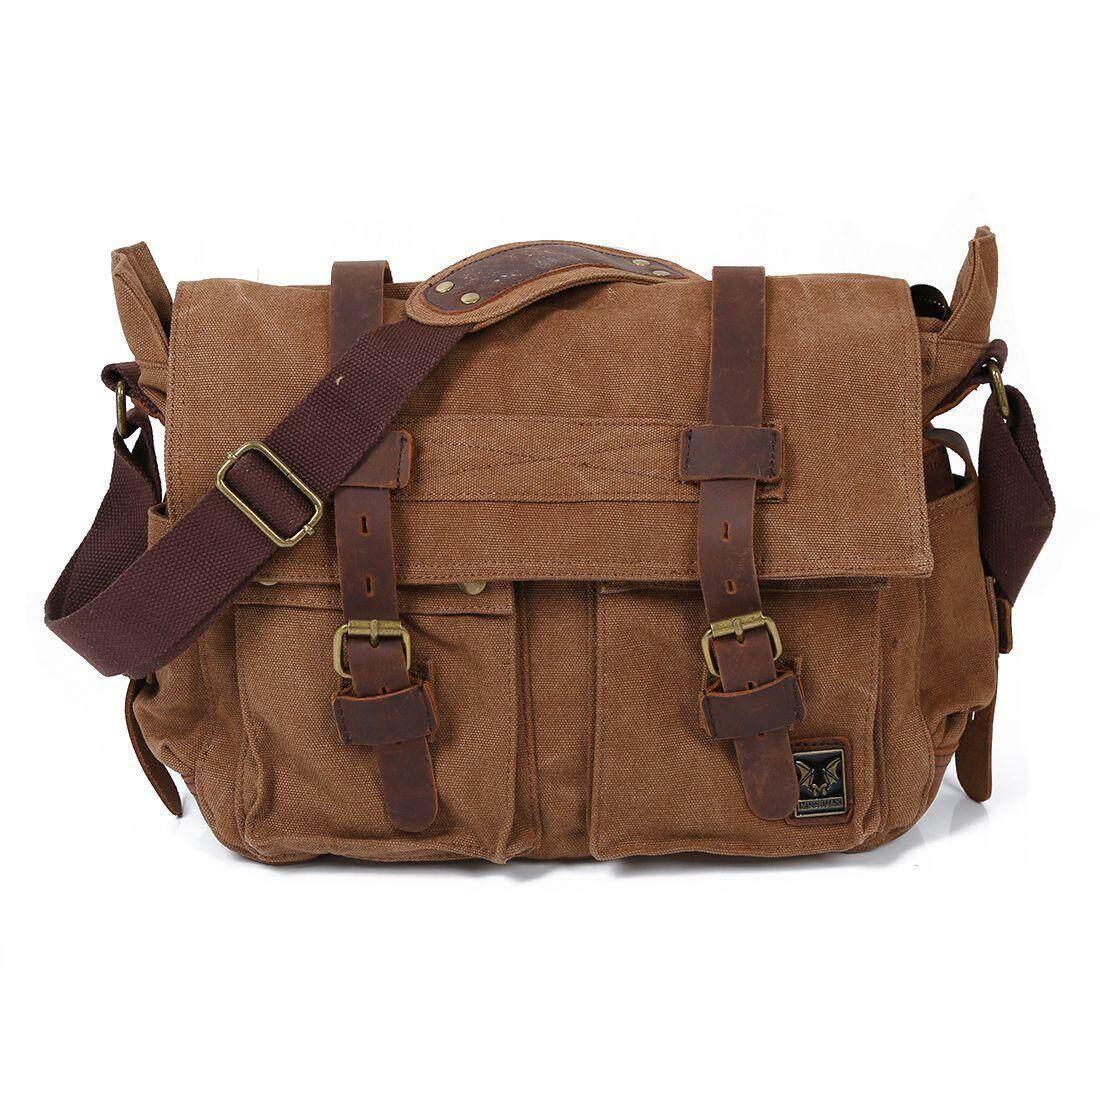 Men s Vintage Canvas Leather School Military Shoulder Bag Messenger Sling Crossbody  Bag Satchel-Light coffee e7dcf7418e879